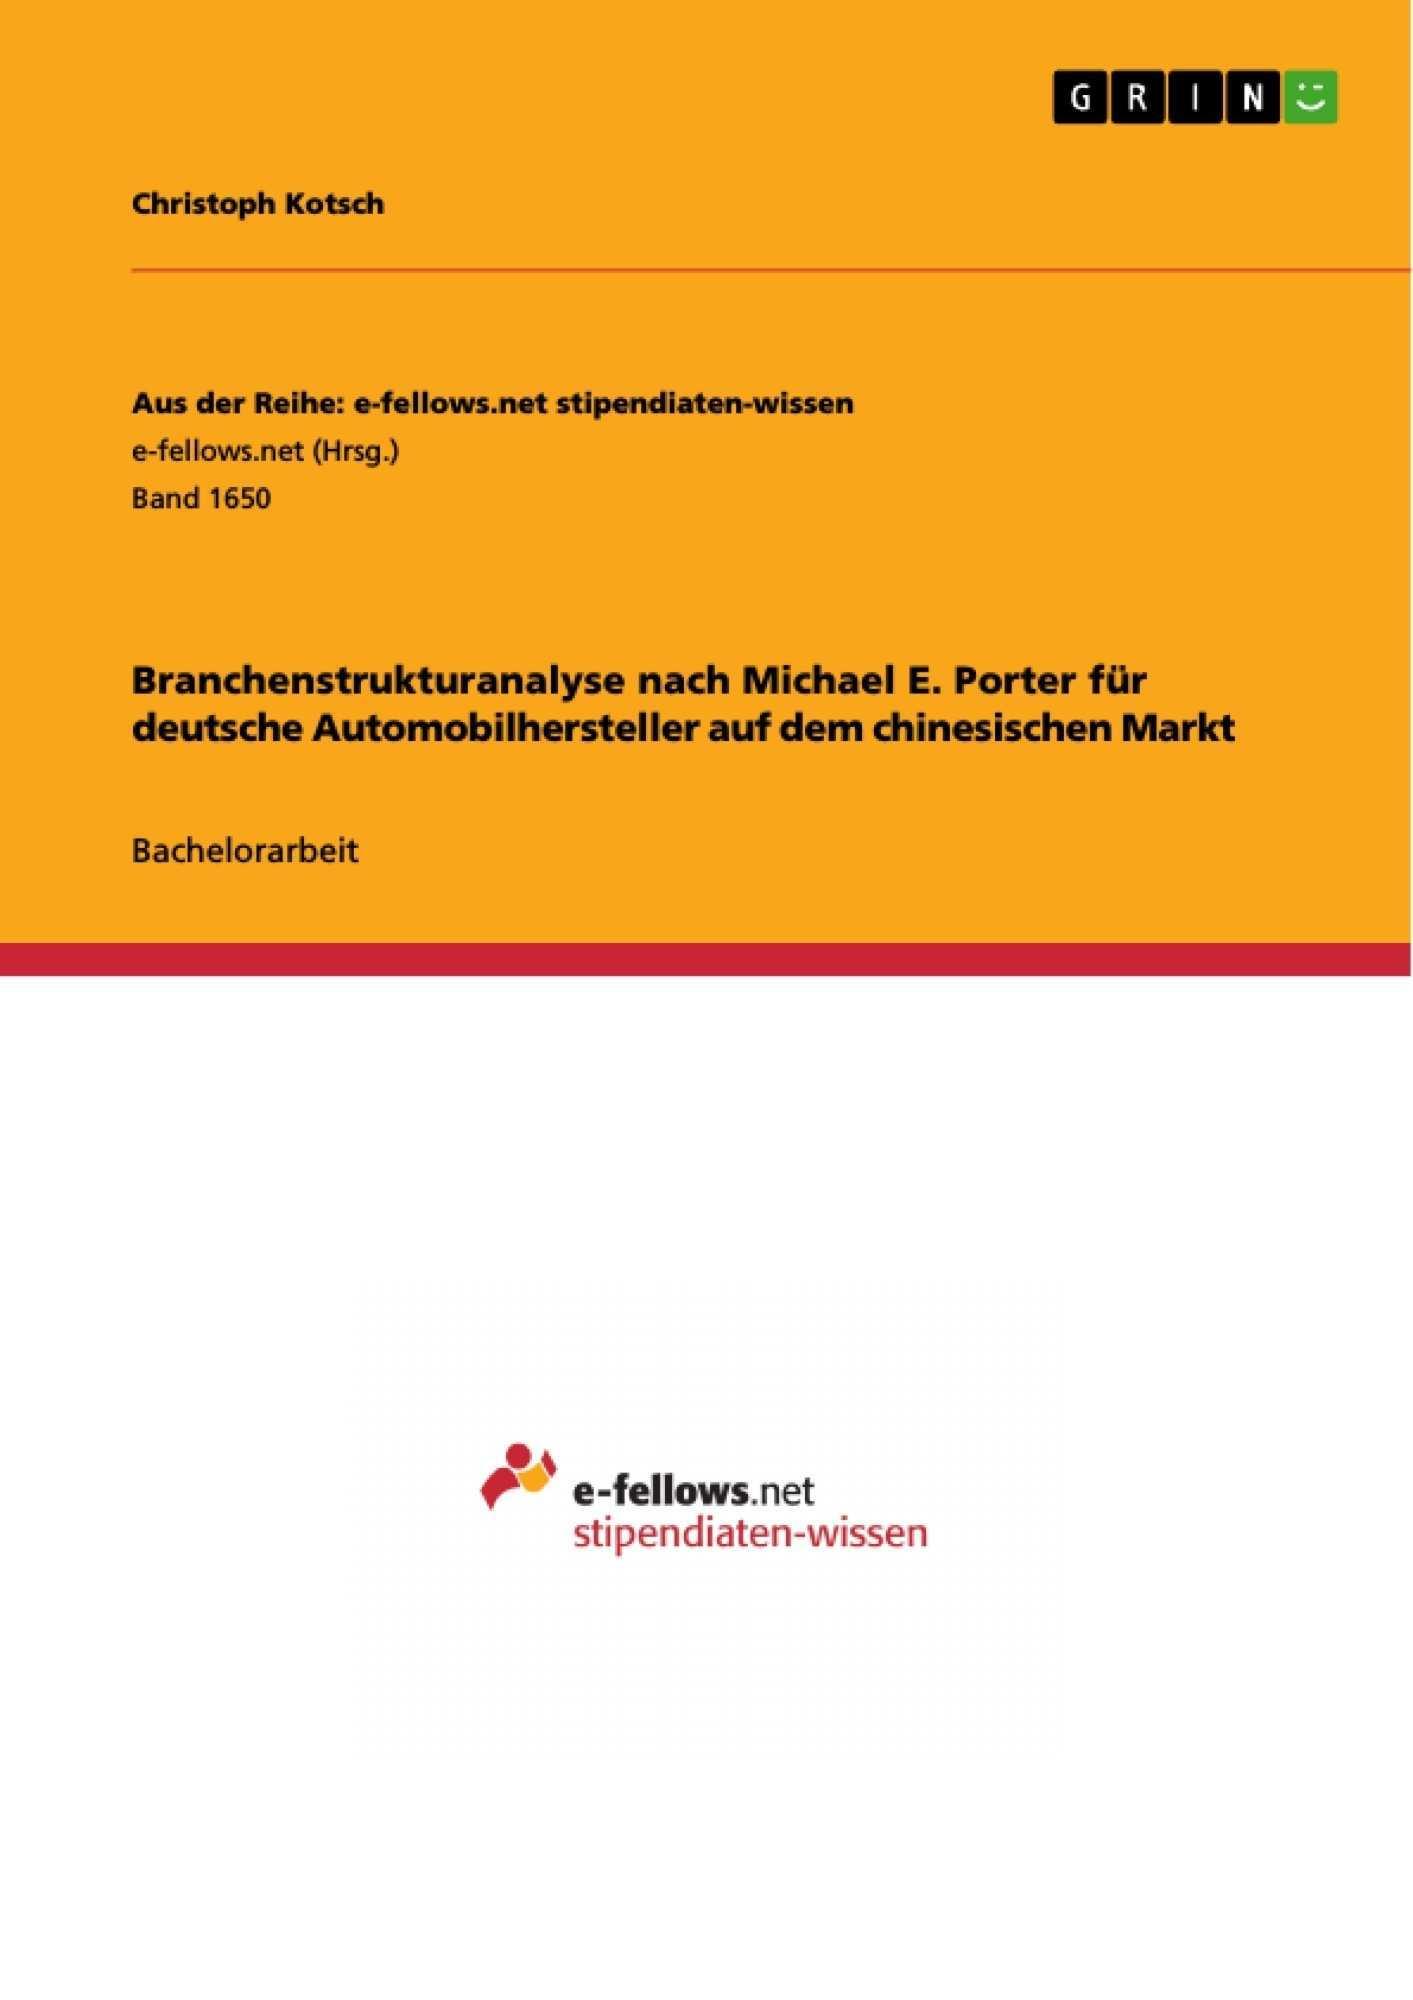 Branchenstrukturanalyse Nach Michael E Diplomarbeiten24 De Diplomarbeiten24 De